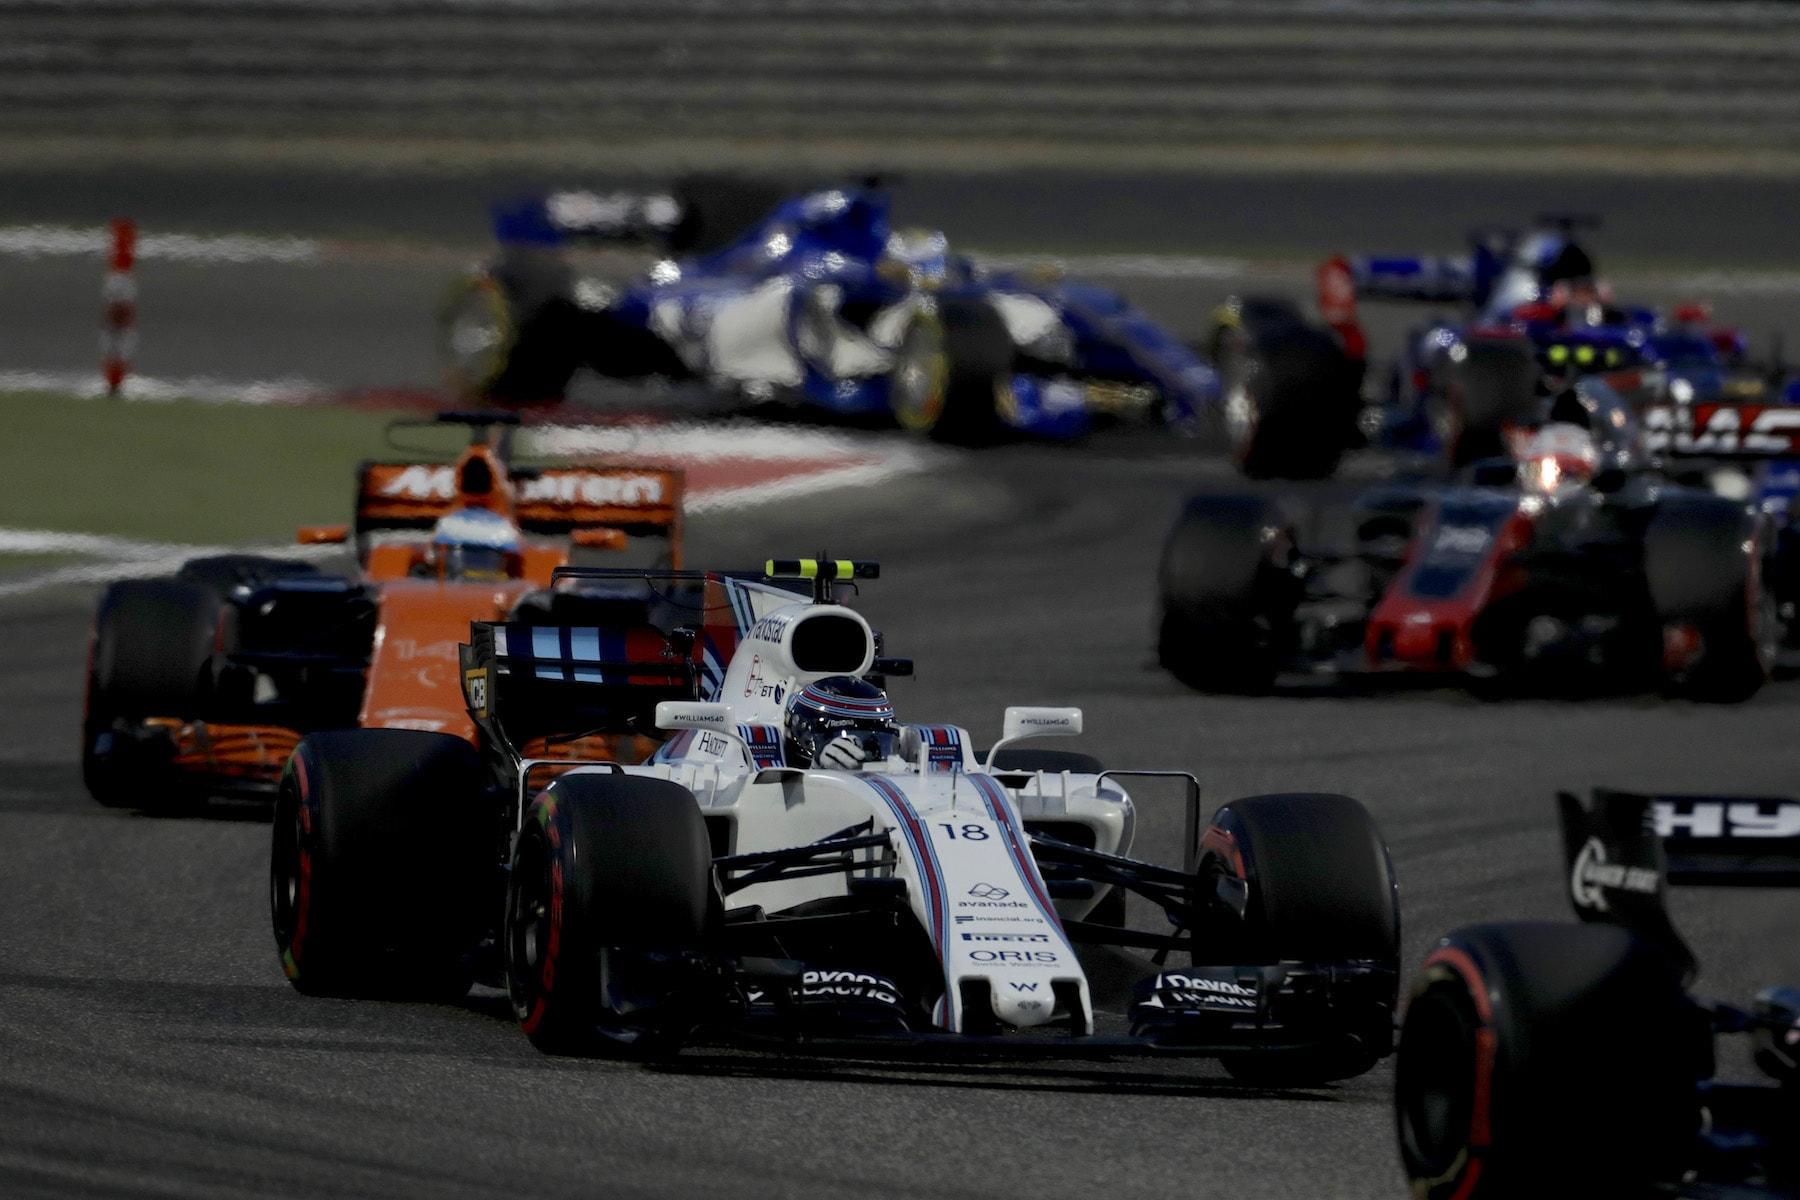 D 2017 Lance Stroll   williams FW40   2017 Bahrain GP DNF copy.JPG